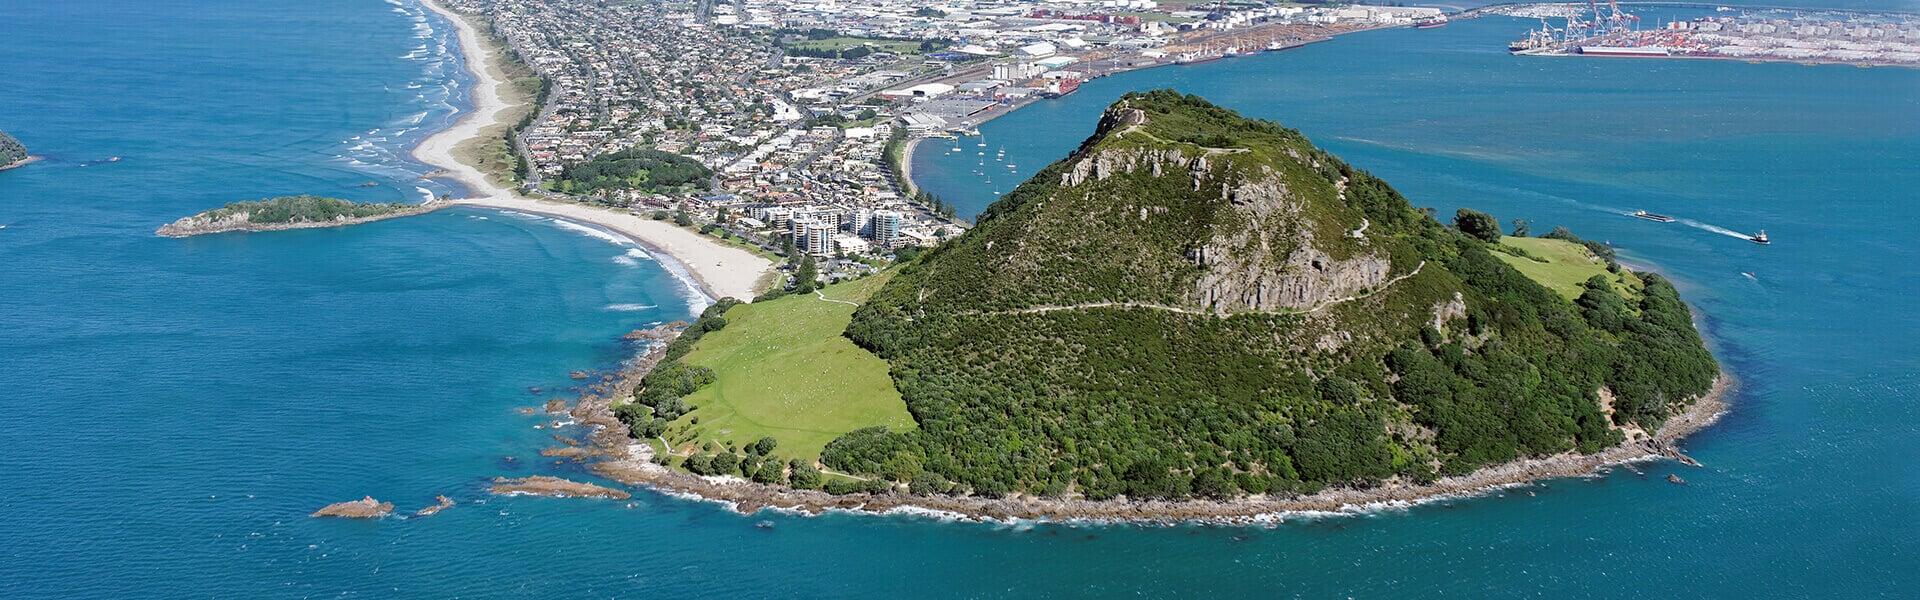 Australia & New Zealand: Sydney & Tauranga to Auckland